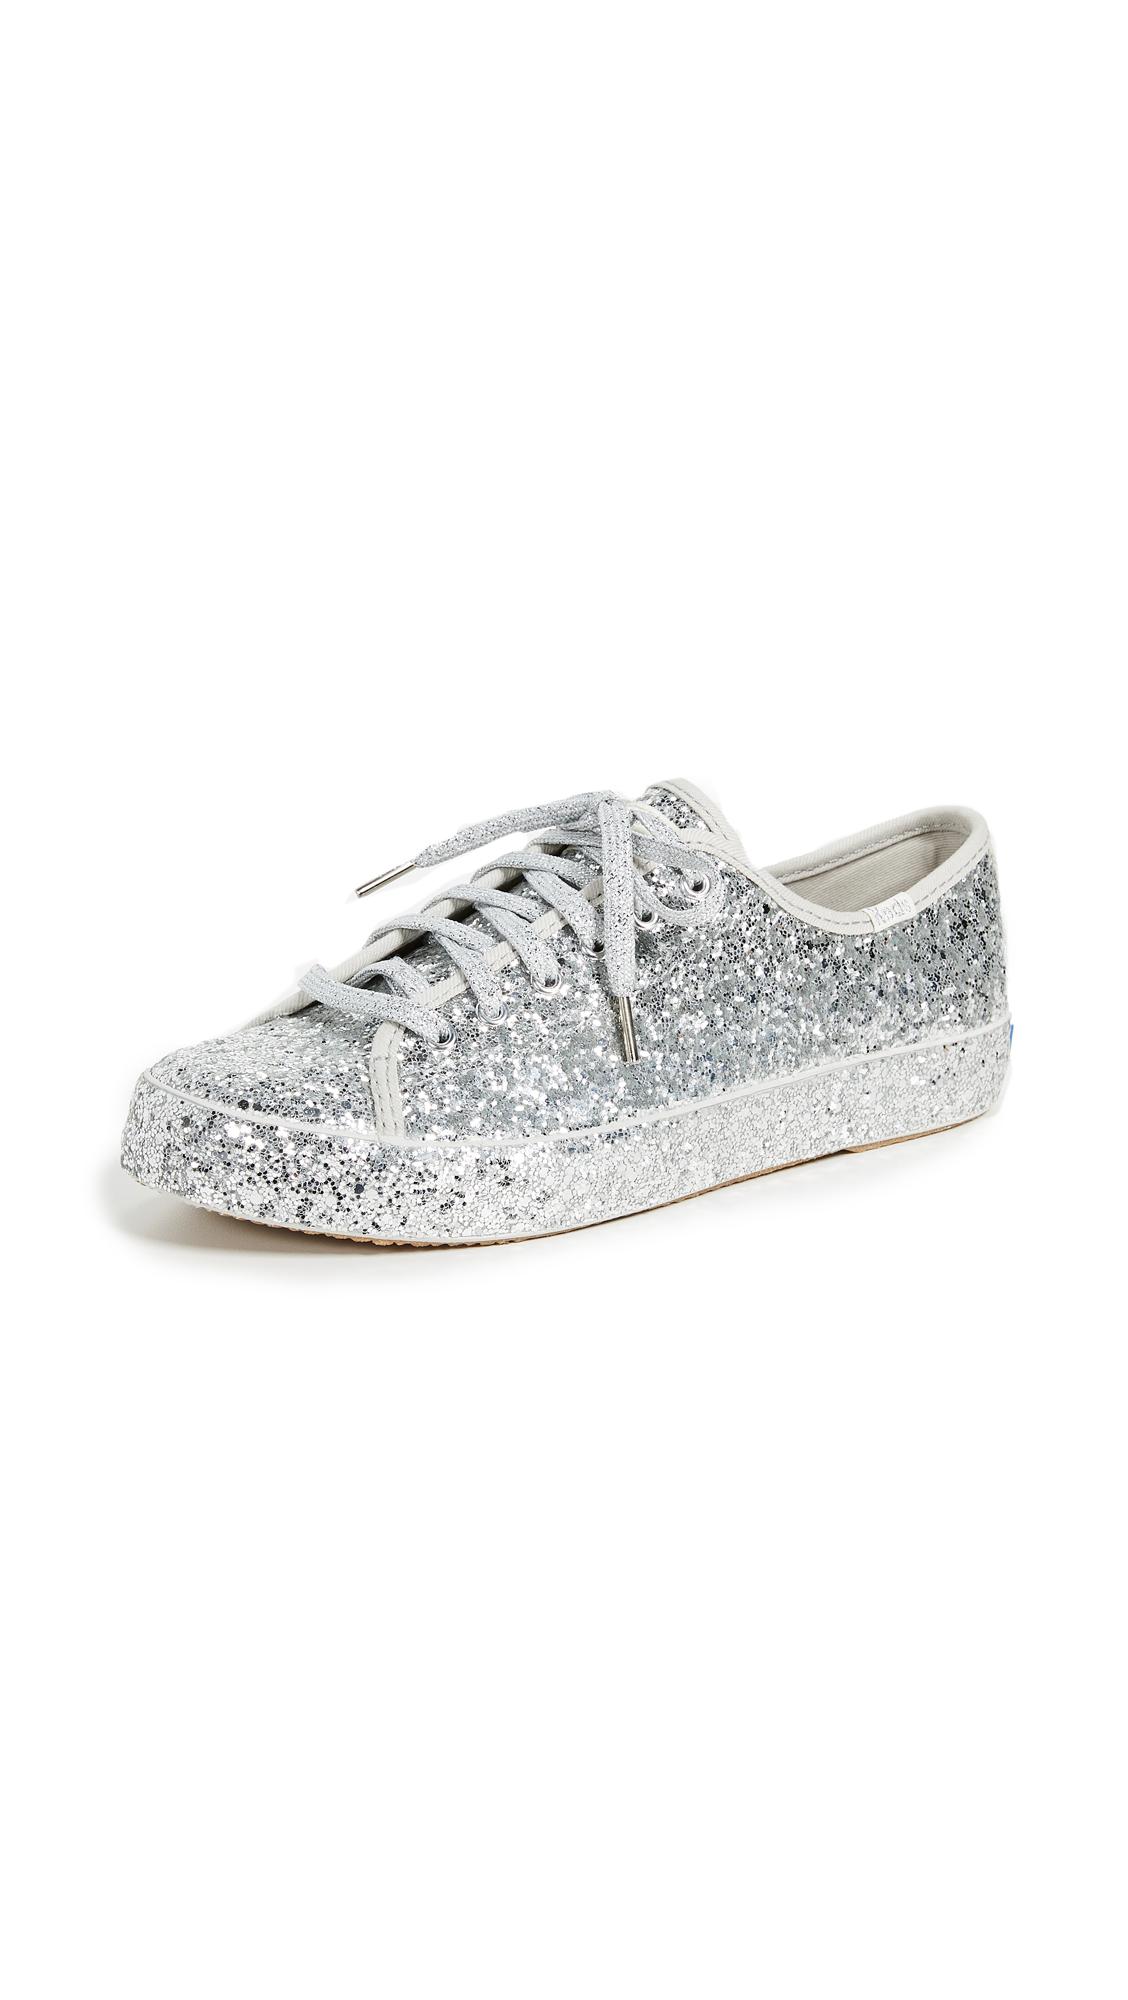 Keds x Kate Spade Kickstart Sneakers - Silver